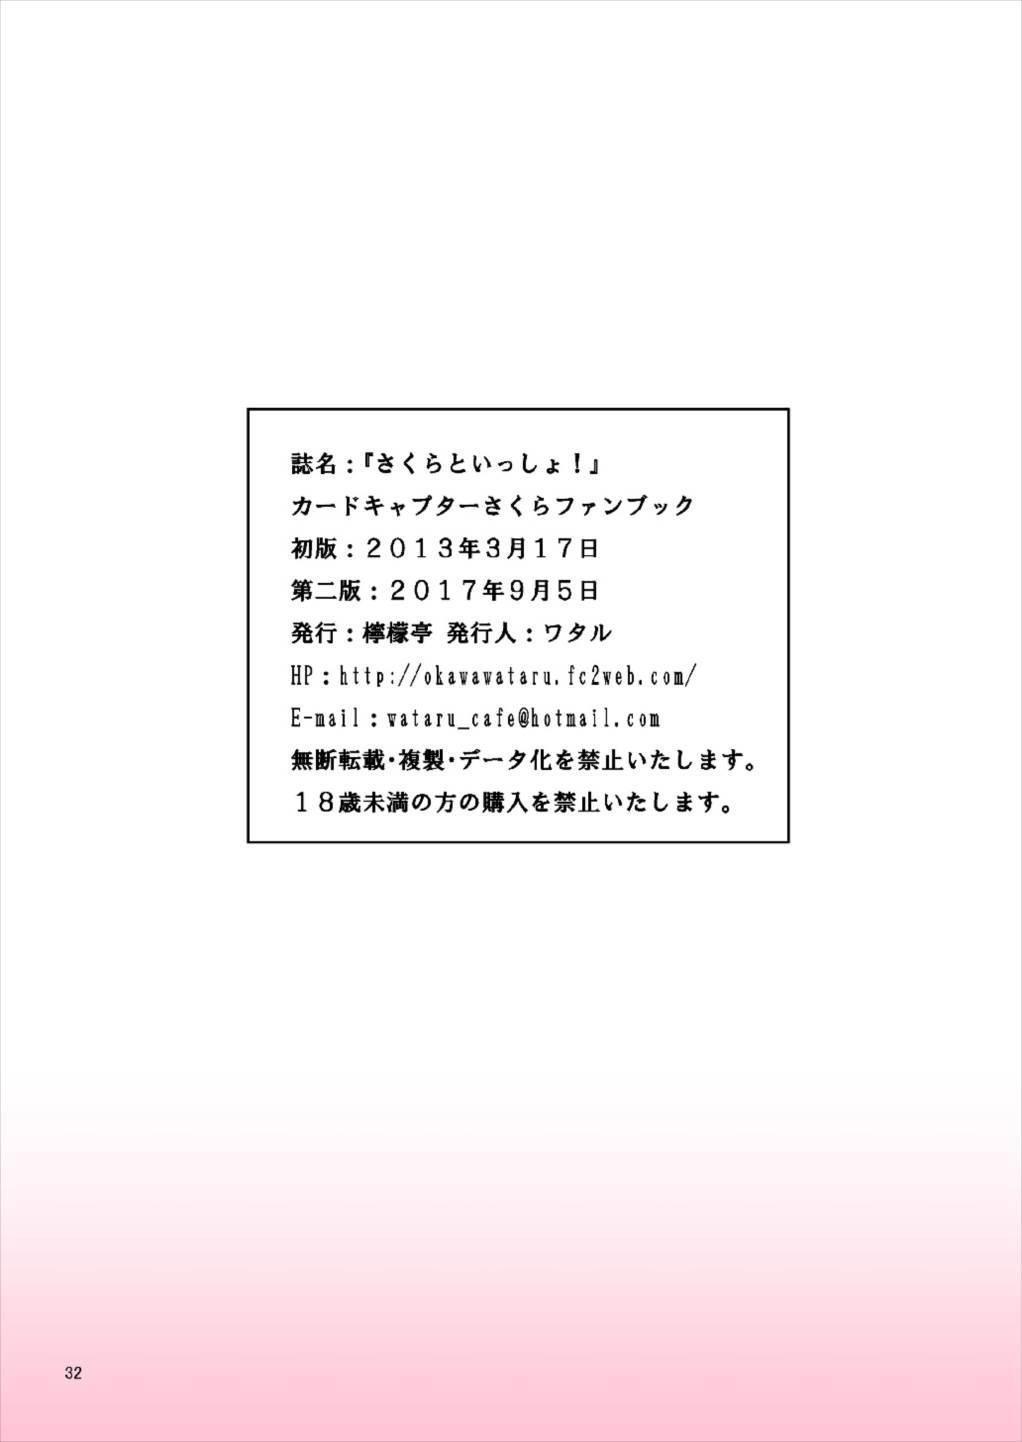 Sakura to Issho! 31